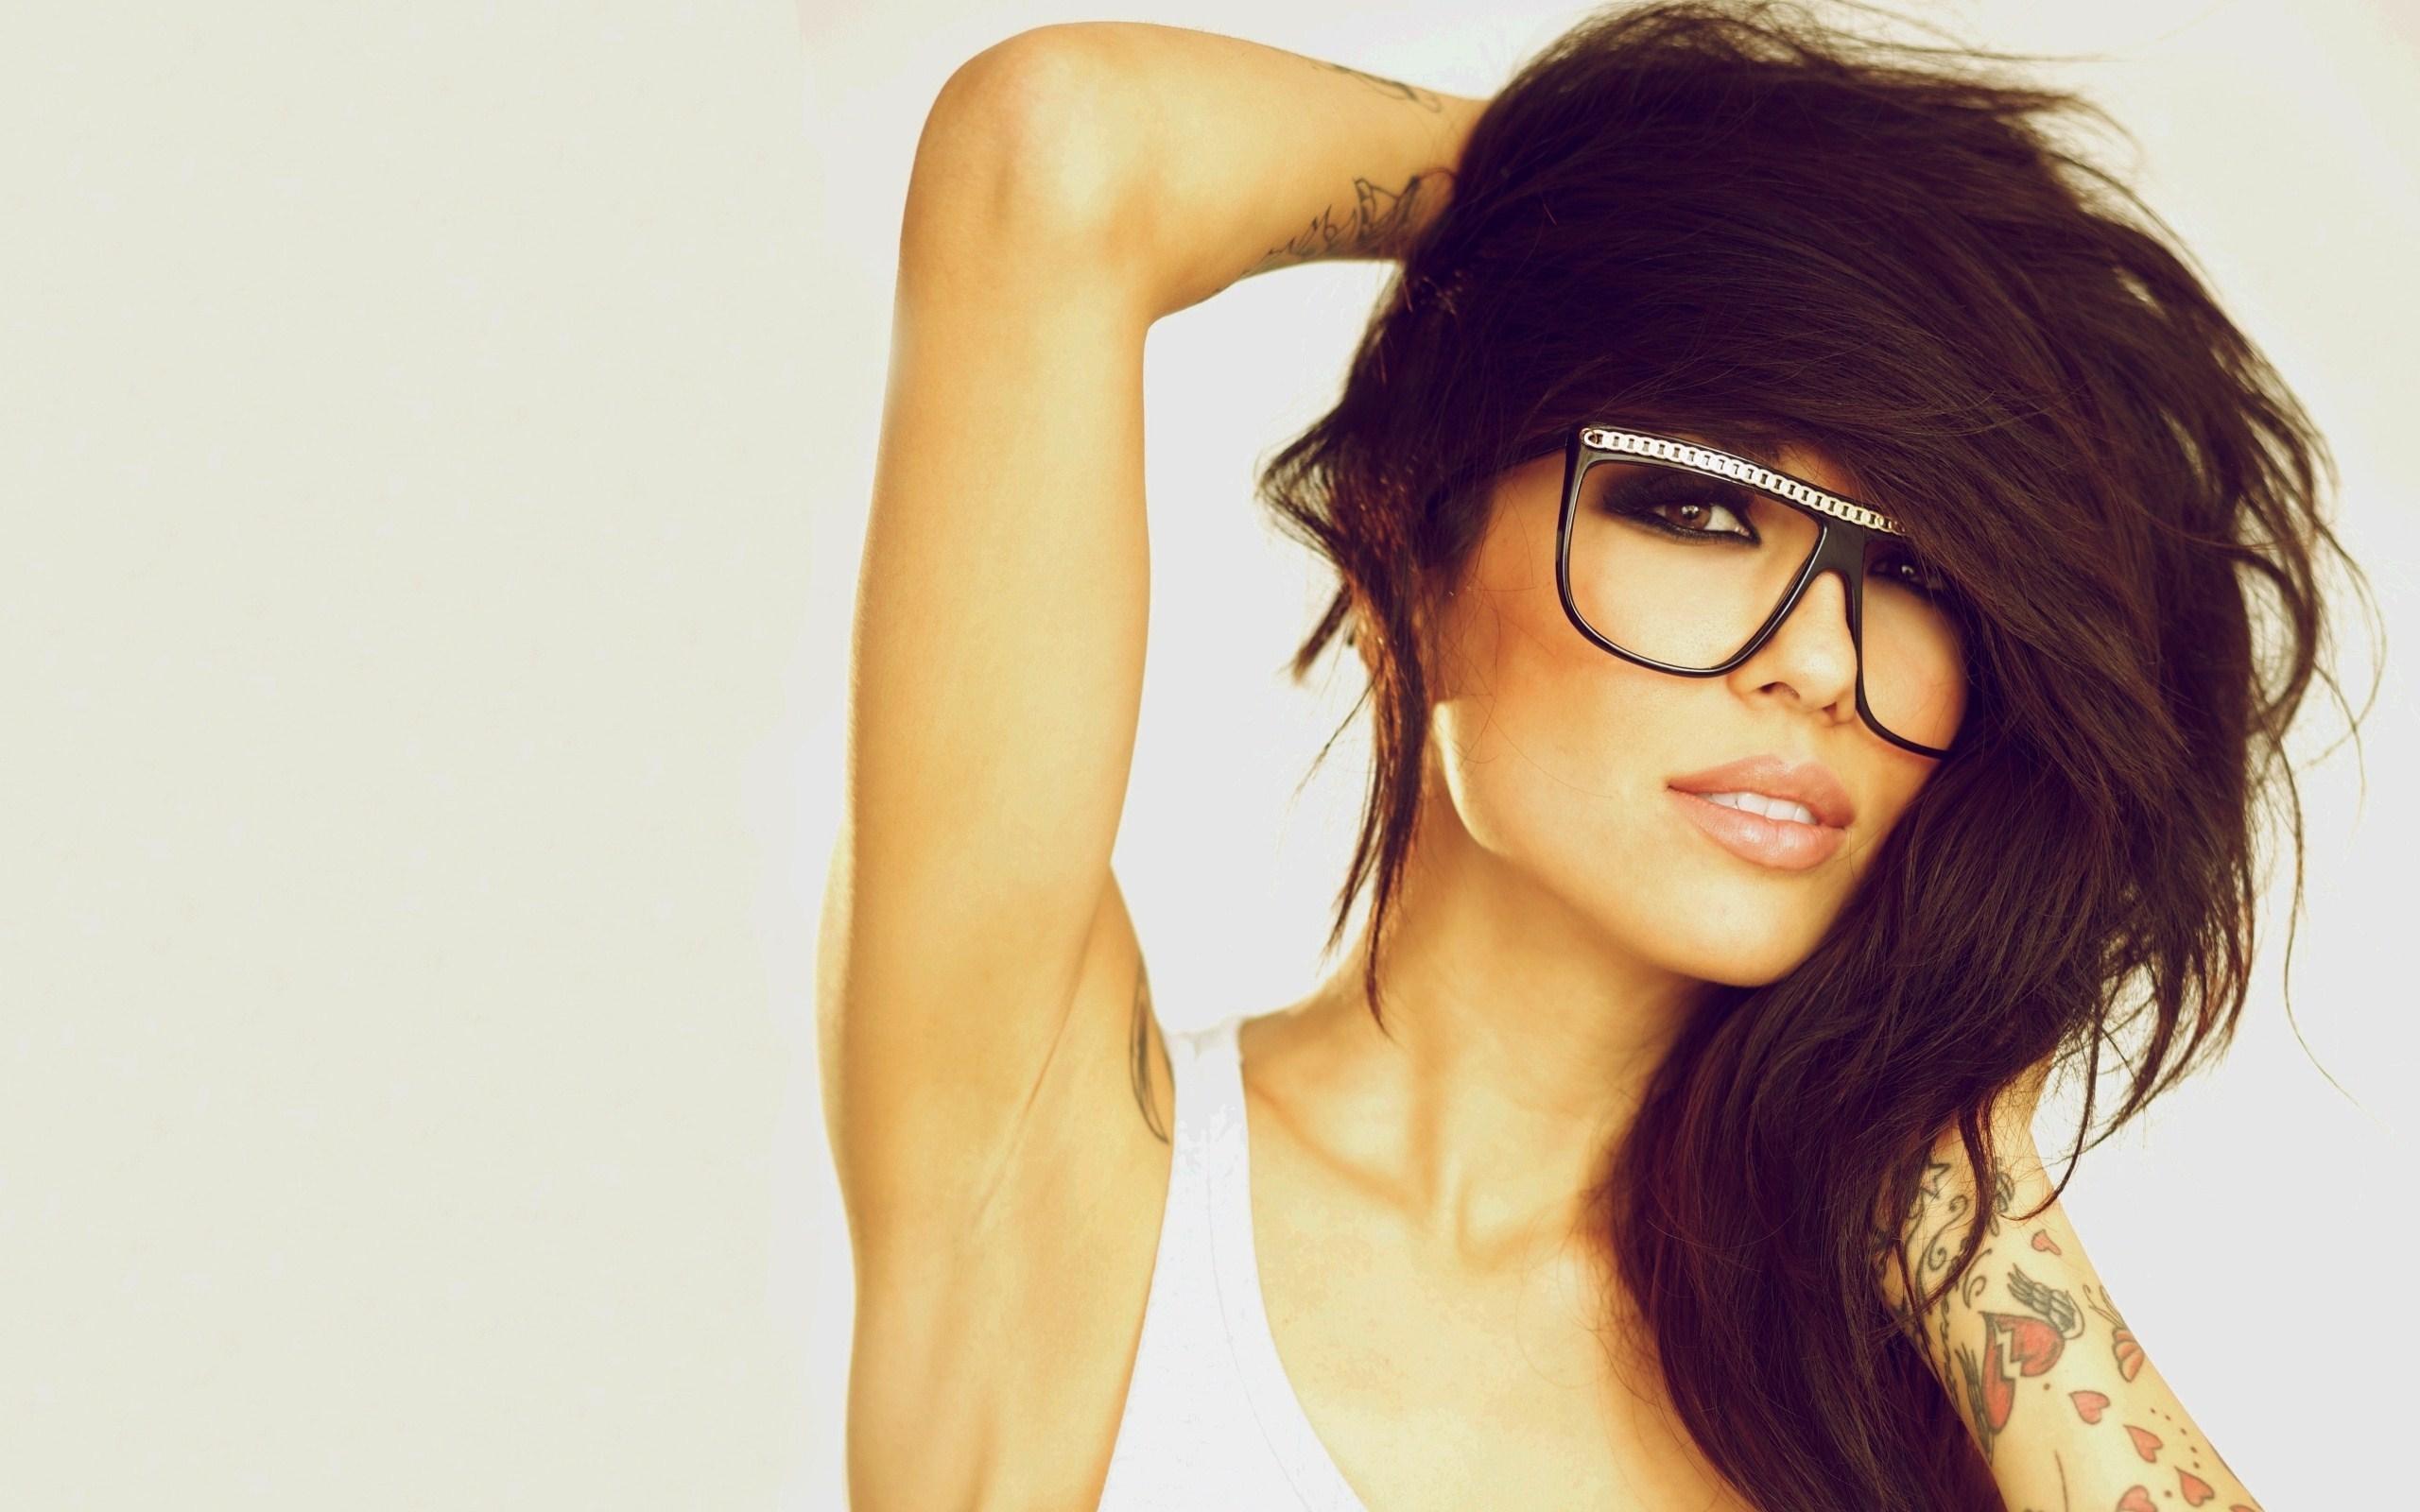 Girl Alie Layus Glasses Portrait